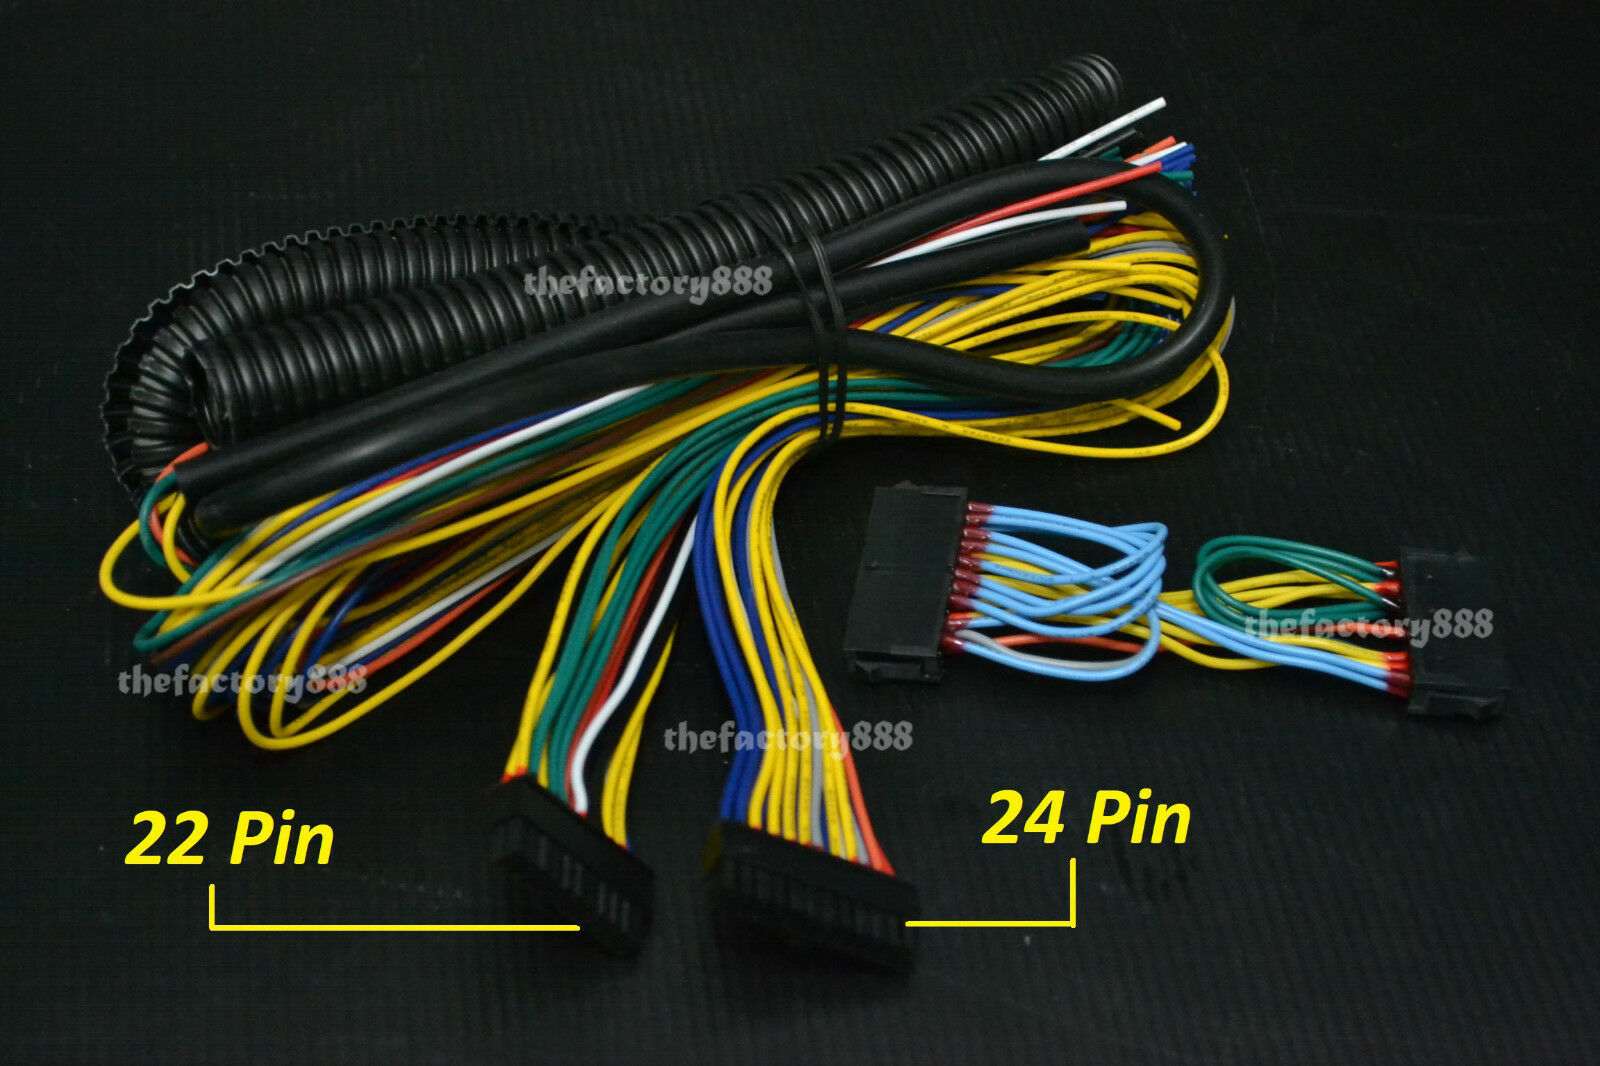 AEM FIC 6 FIC 8 Fuel Ignition Controller Harness Universal | eBay | Aem Fic Wiring Harness 6 |  | eBay